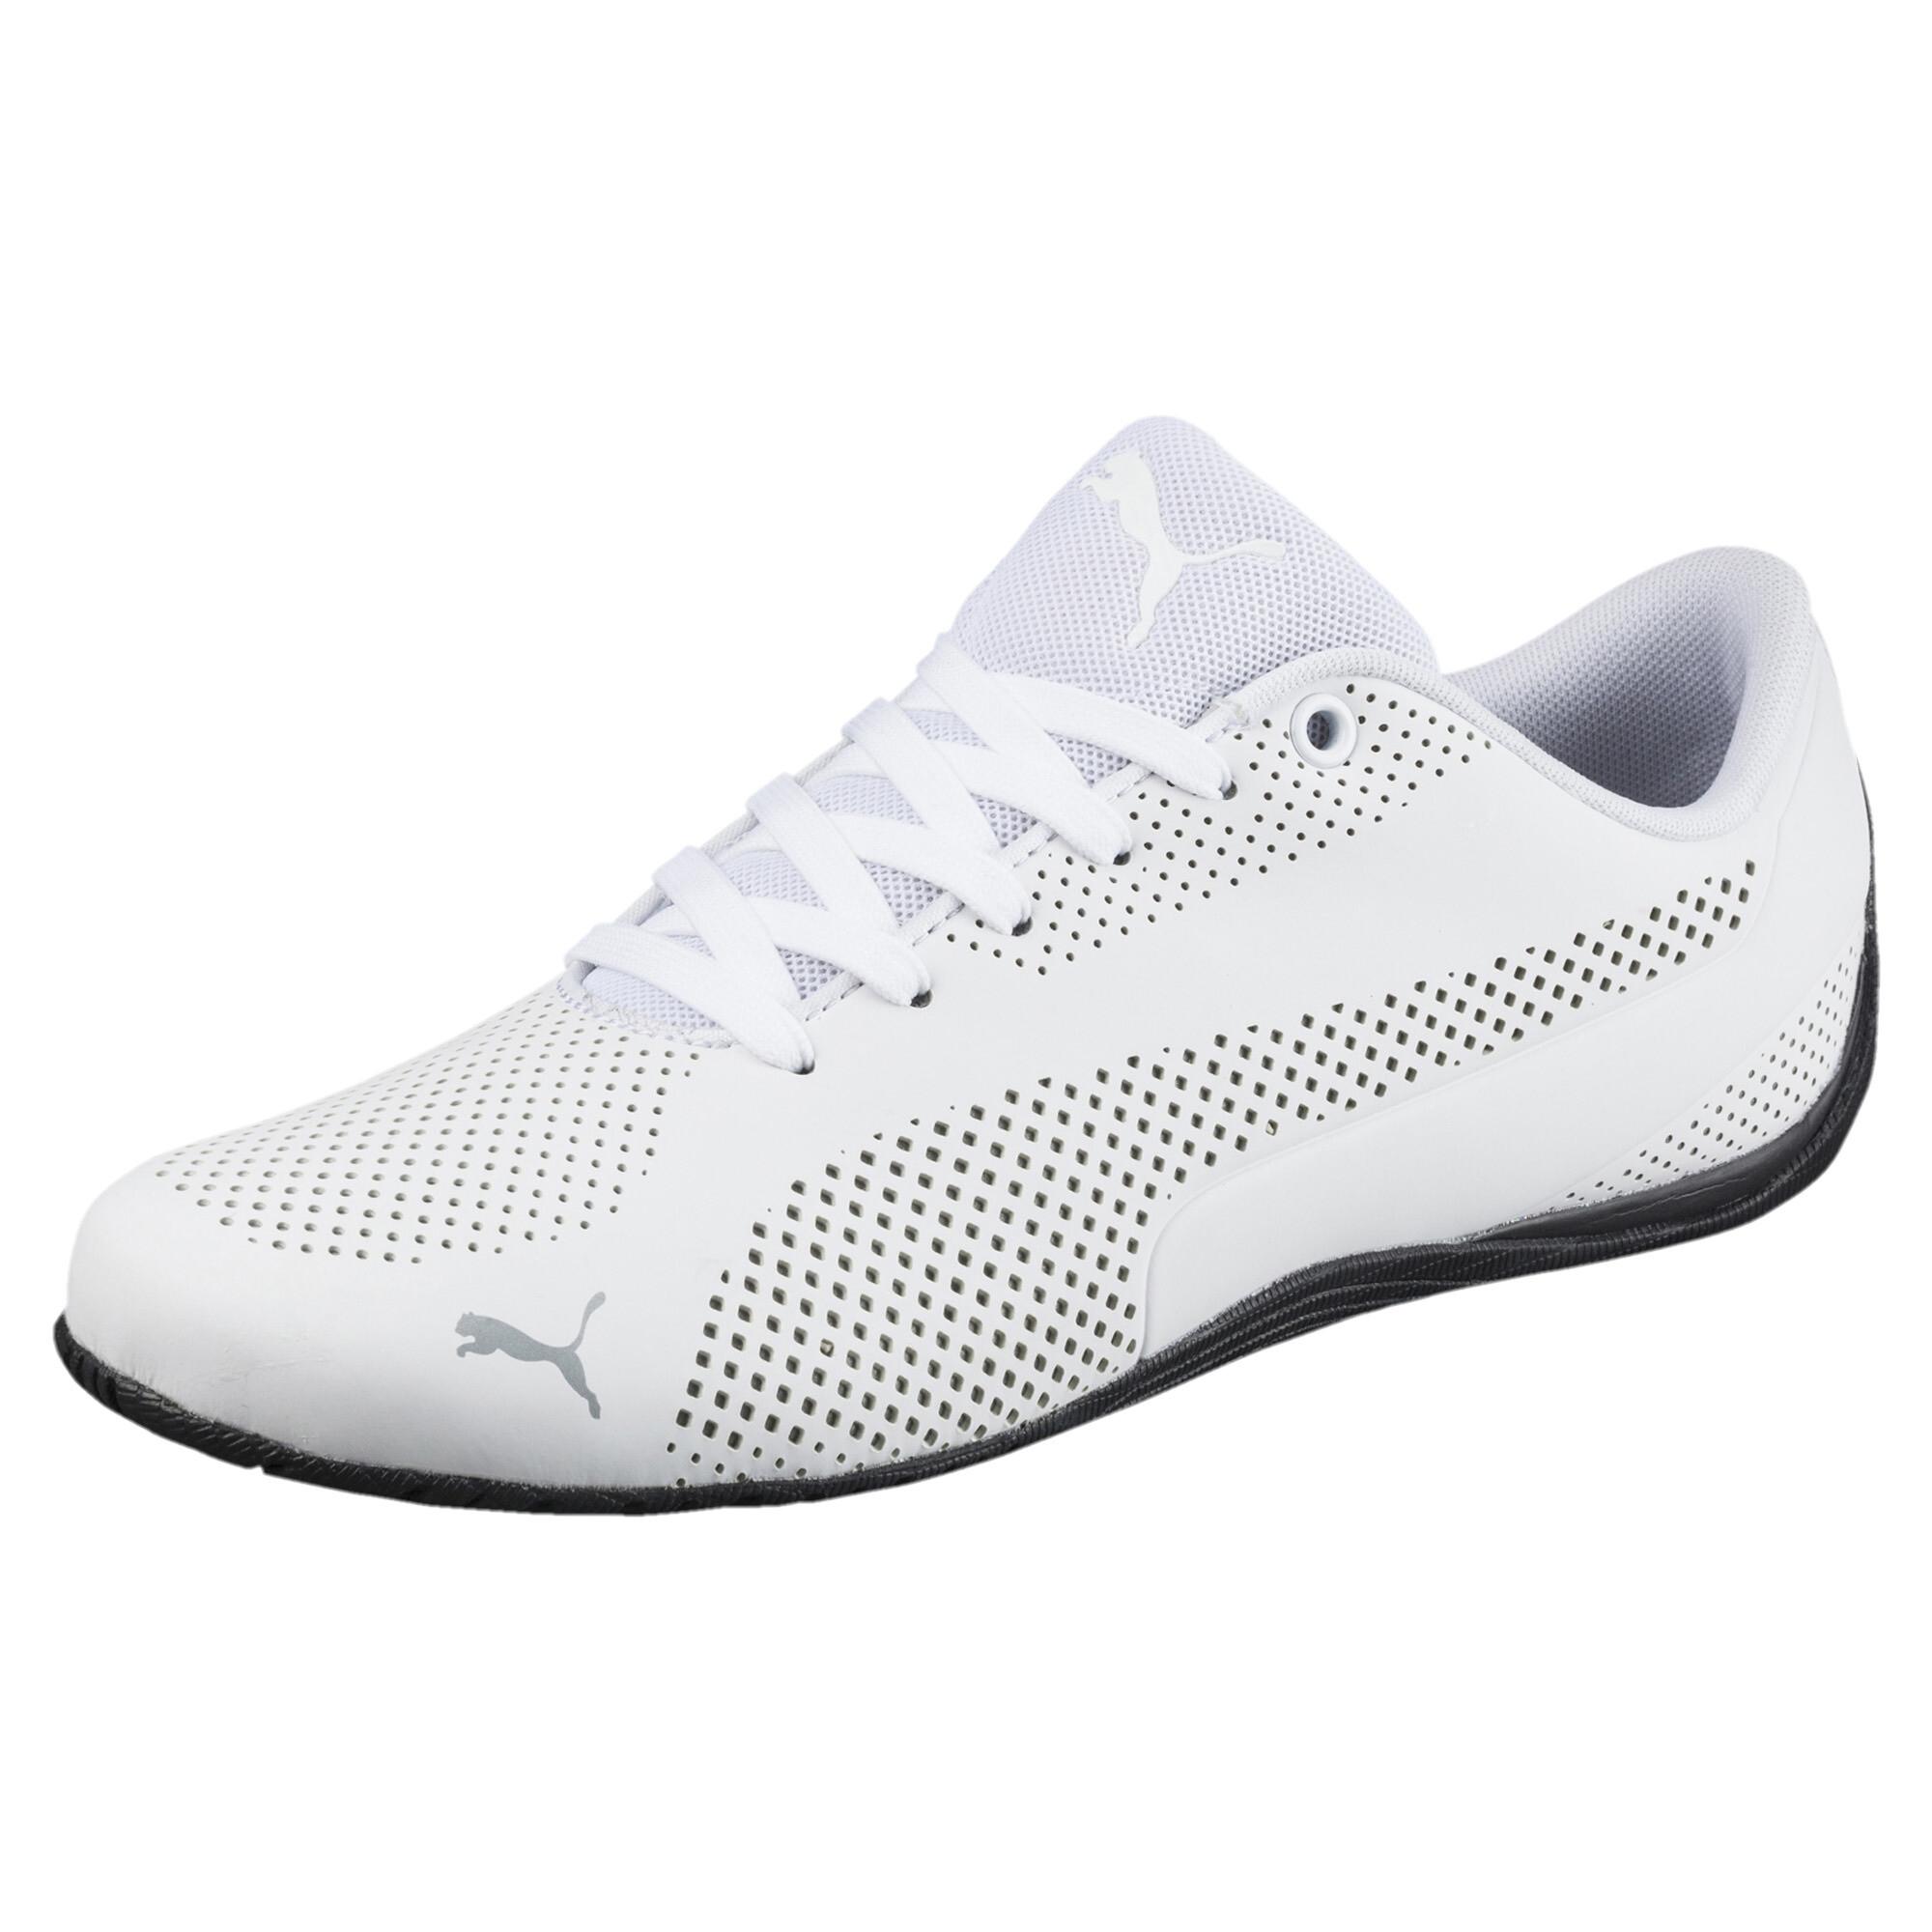 PUMA-Drift-Cat-Ultra-Reflective-Men-039-s-Shoes-Men-Shoe-Sport-Classics thumbnail 10